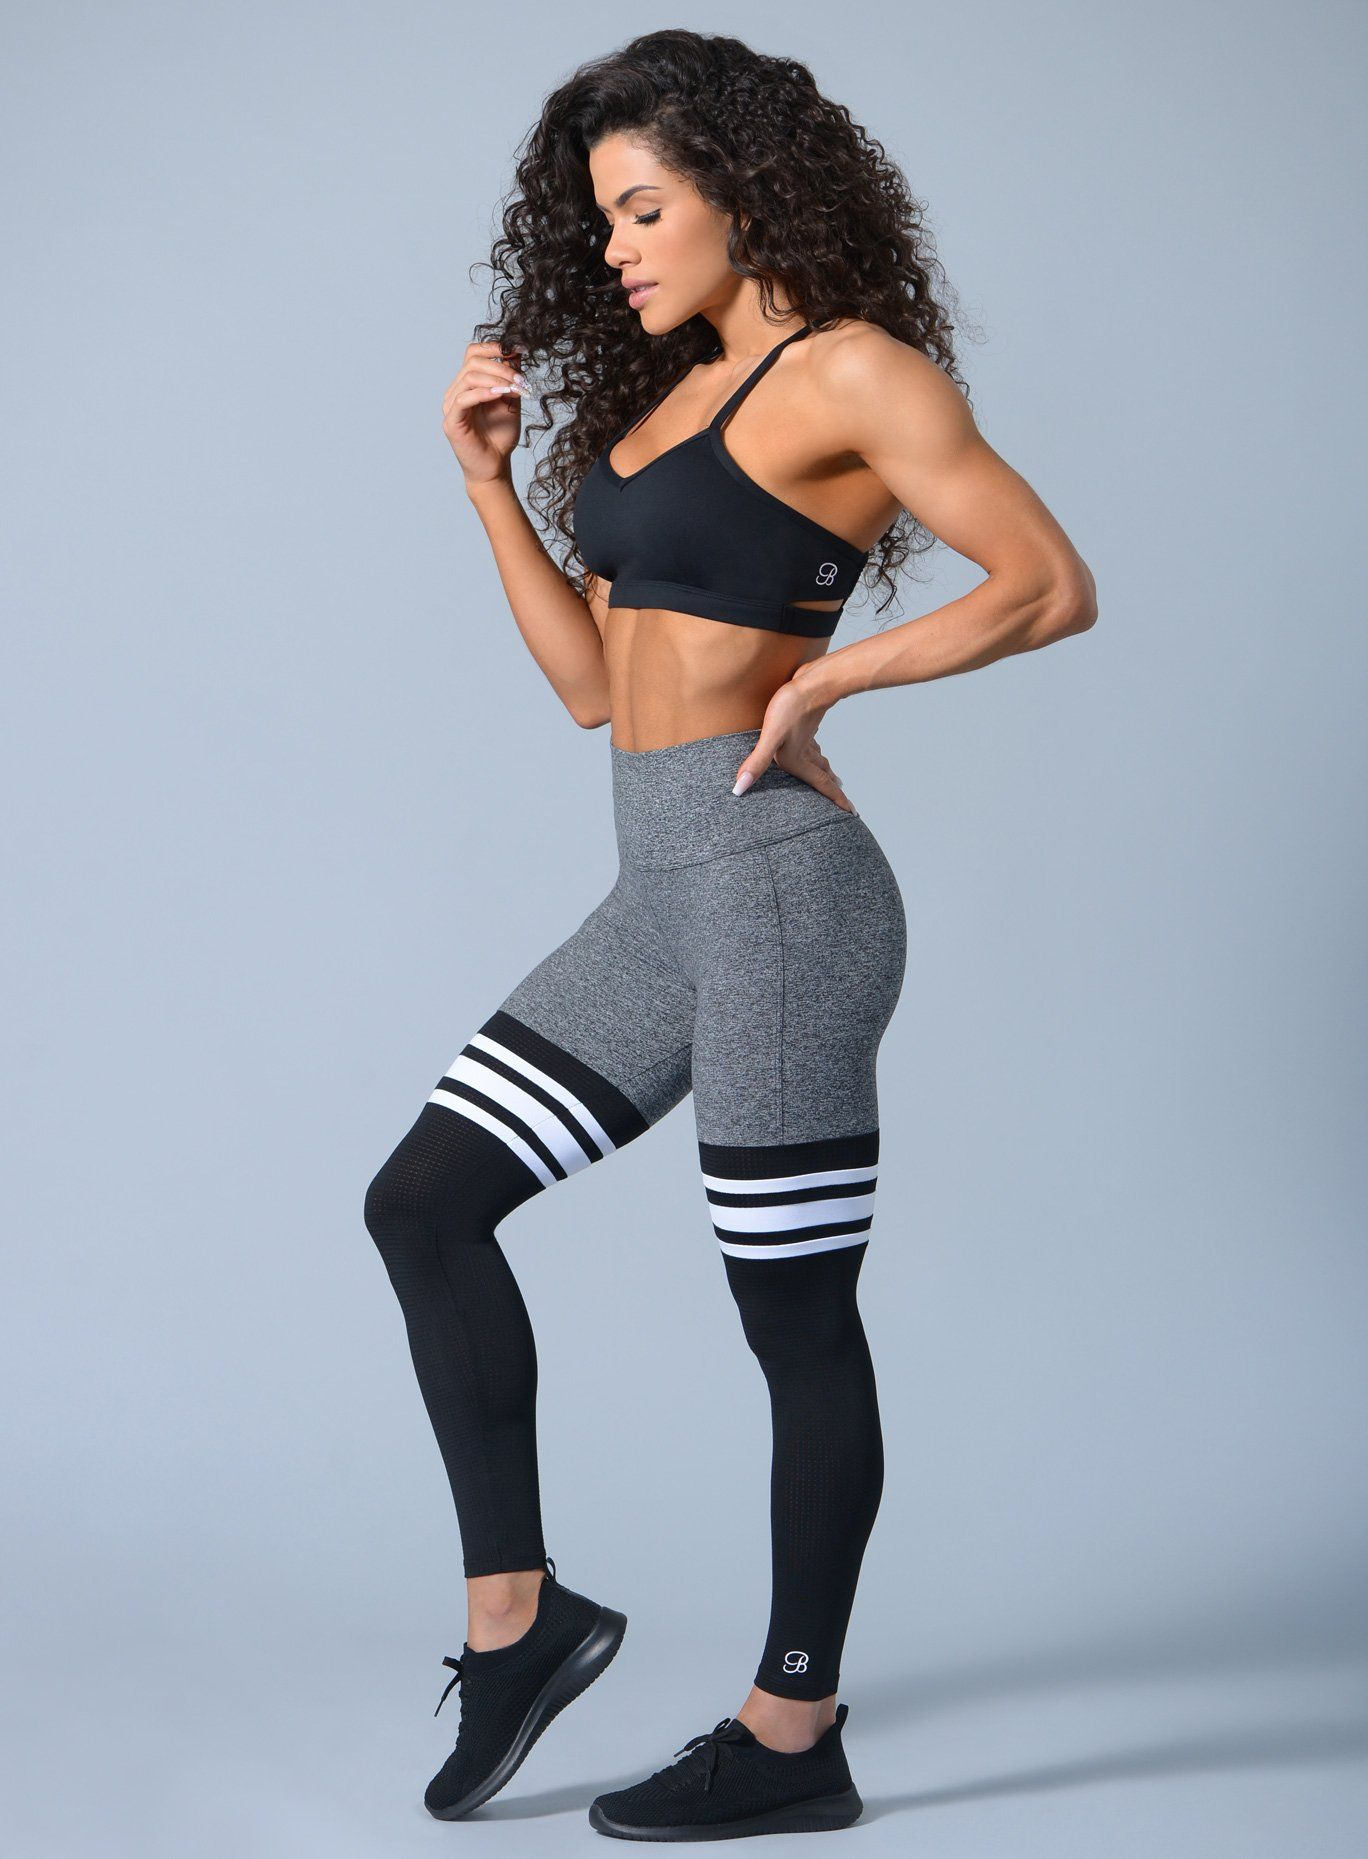 Thigh-Highs 'Heather' #stripedleggings